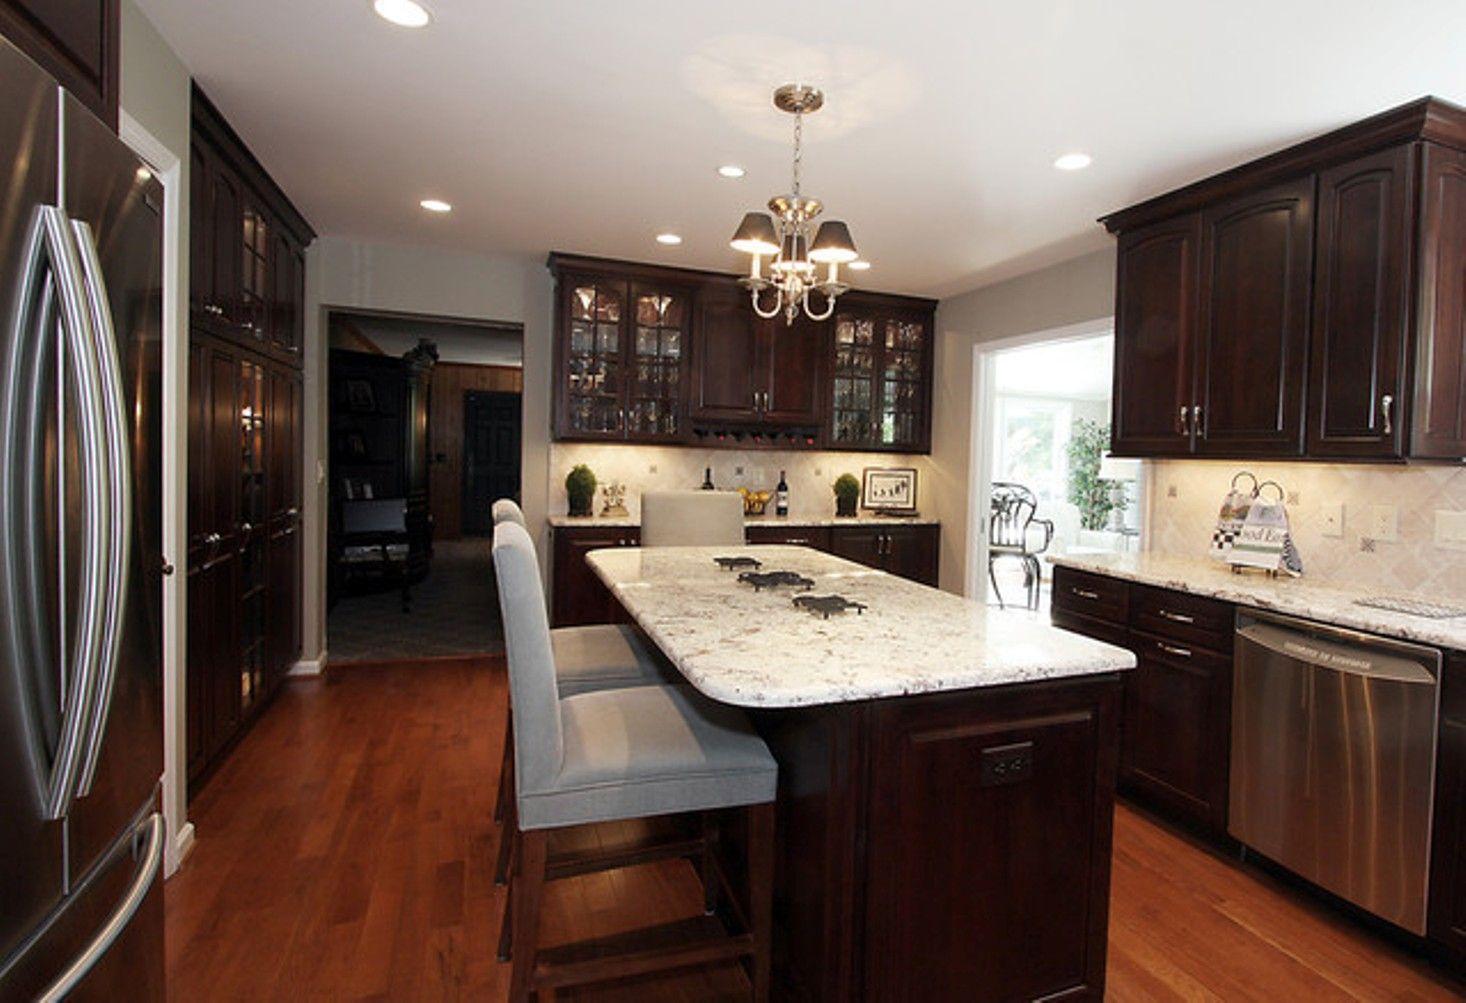 kitchen-renovation-ideas-throughout-average-cost-of-small-kitchen ...